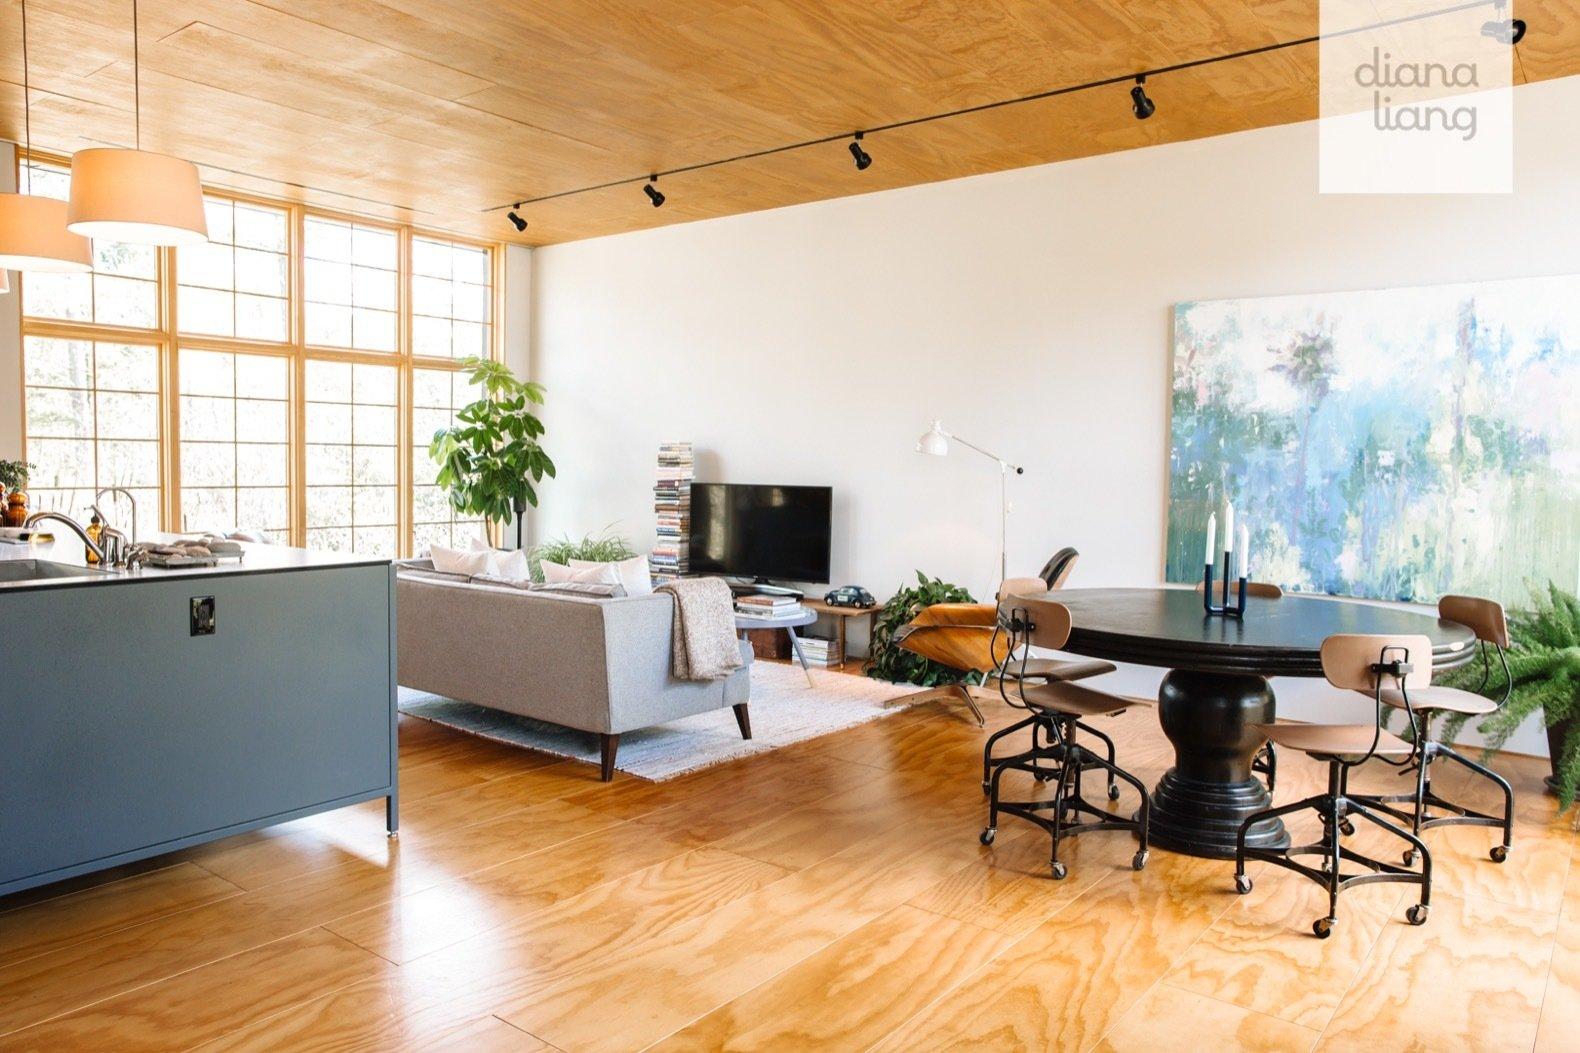 Hygge Supply Lake House interior